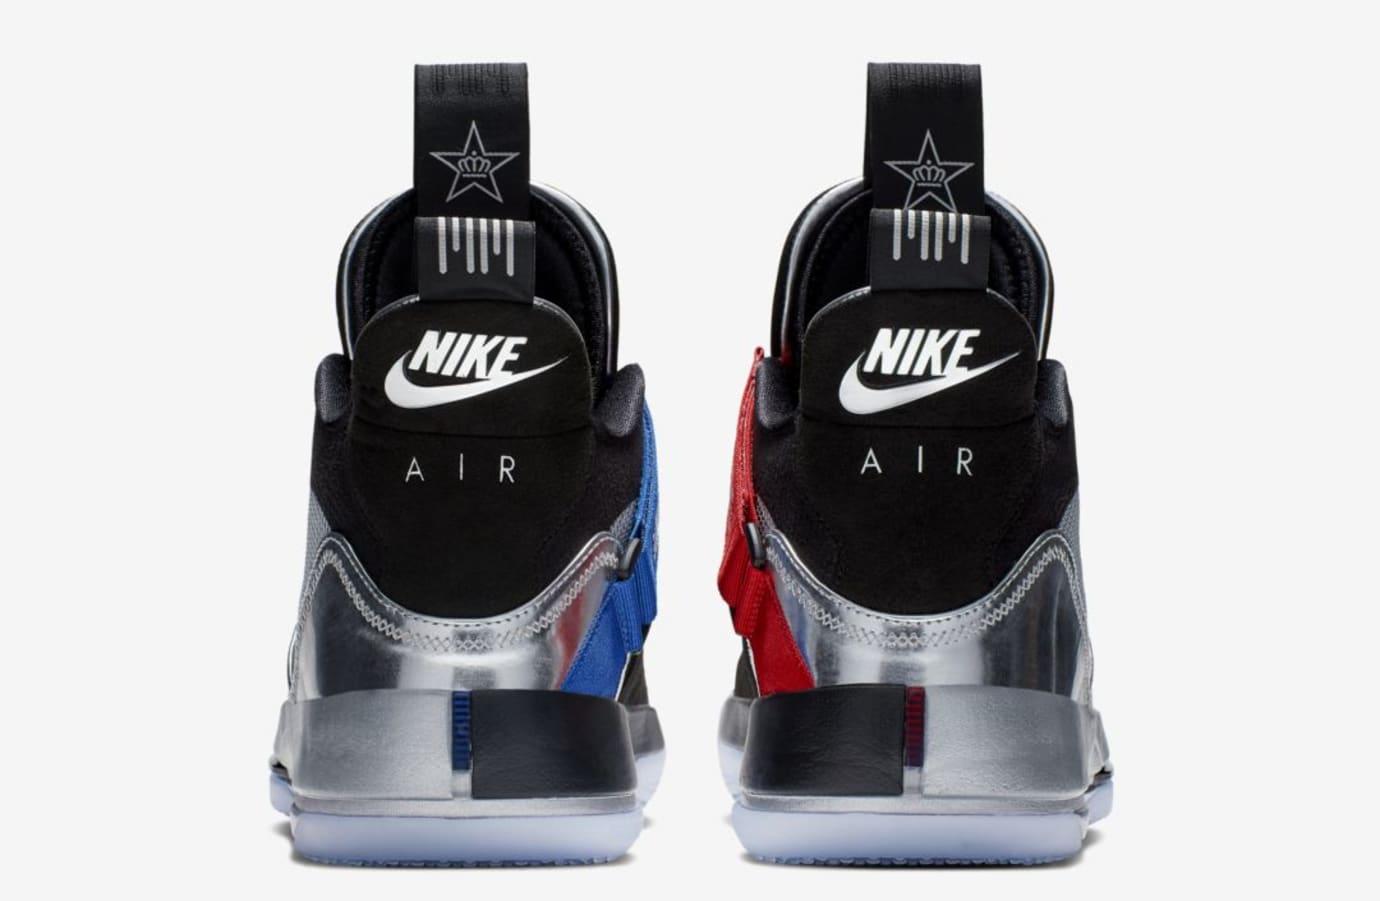 air-jordan-33-black-metallic-silver-aq8830-005-heel